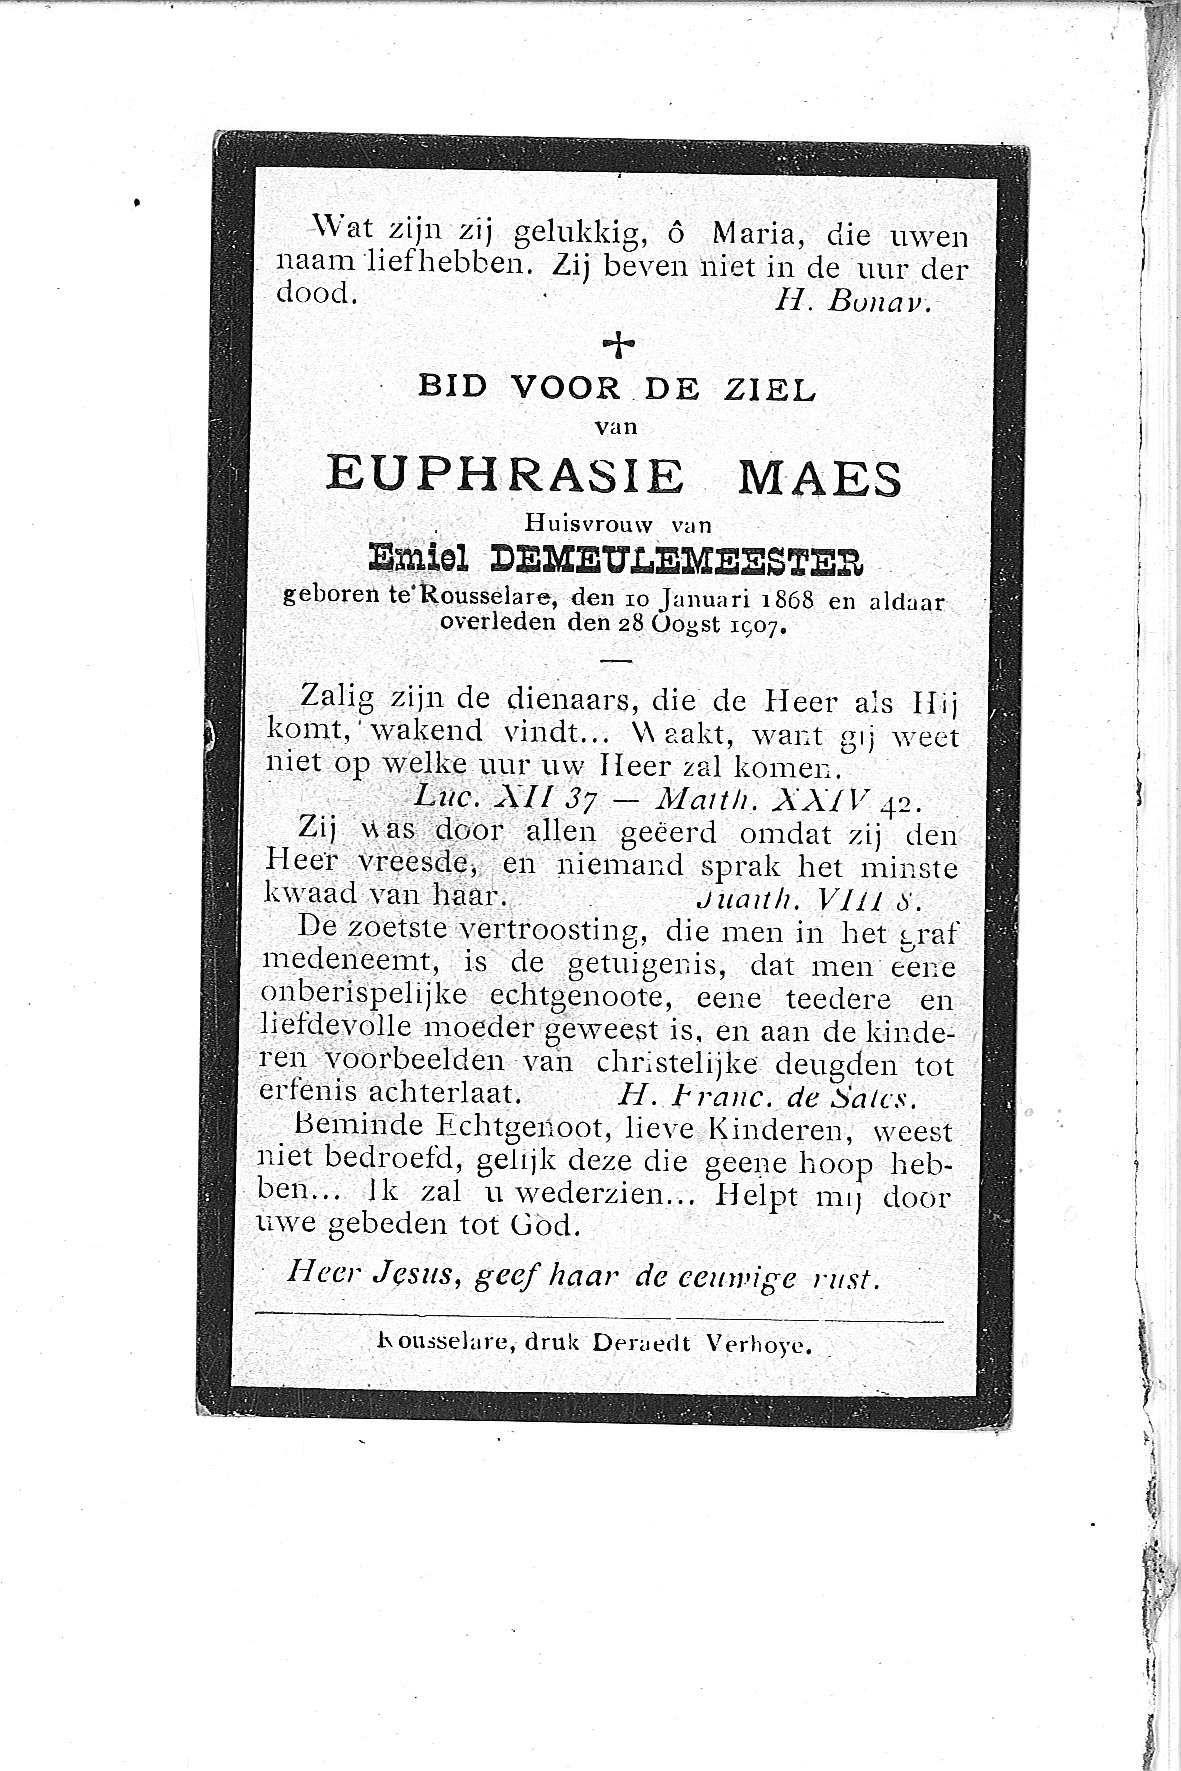 Euphrasie(1907)20111108130504_00098.jpg